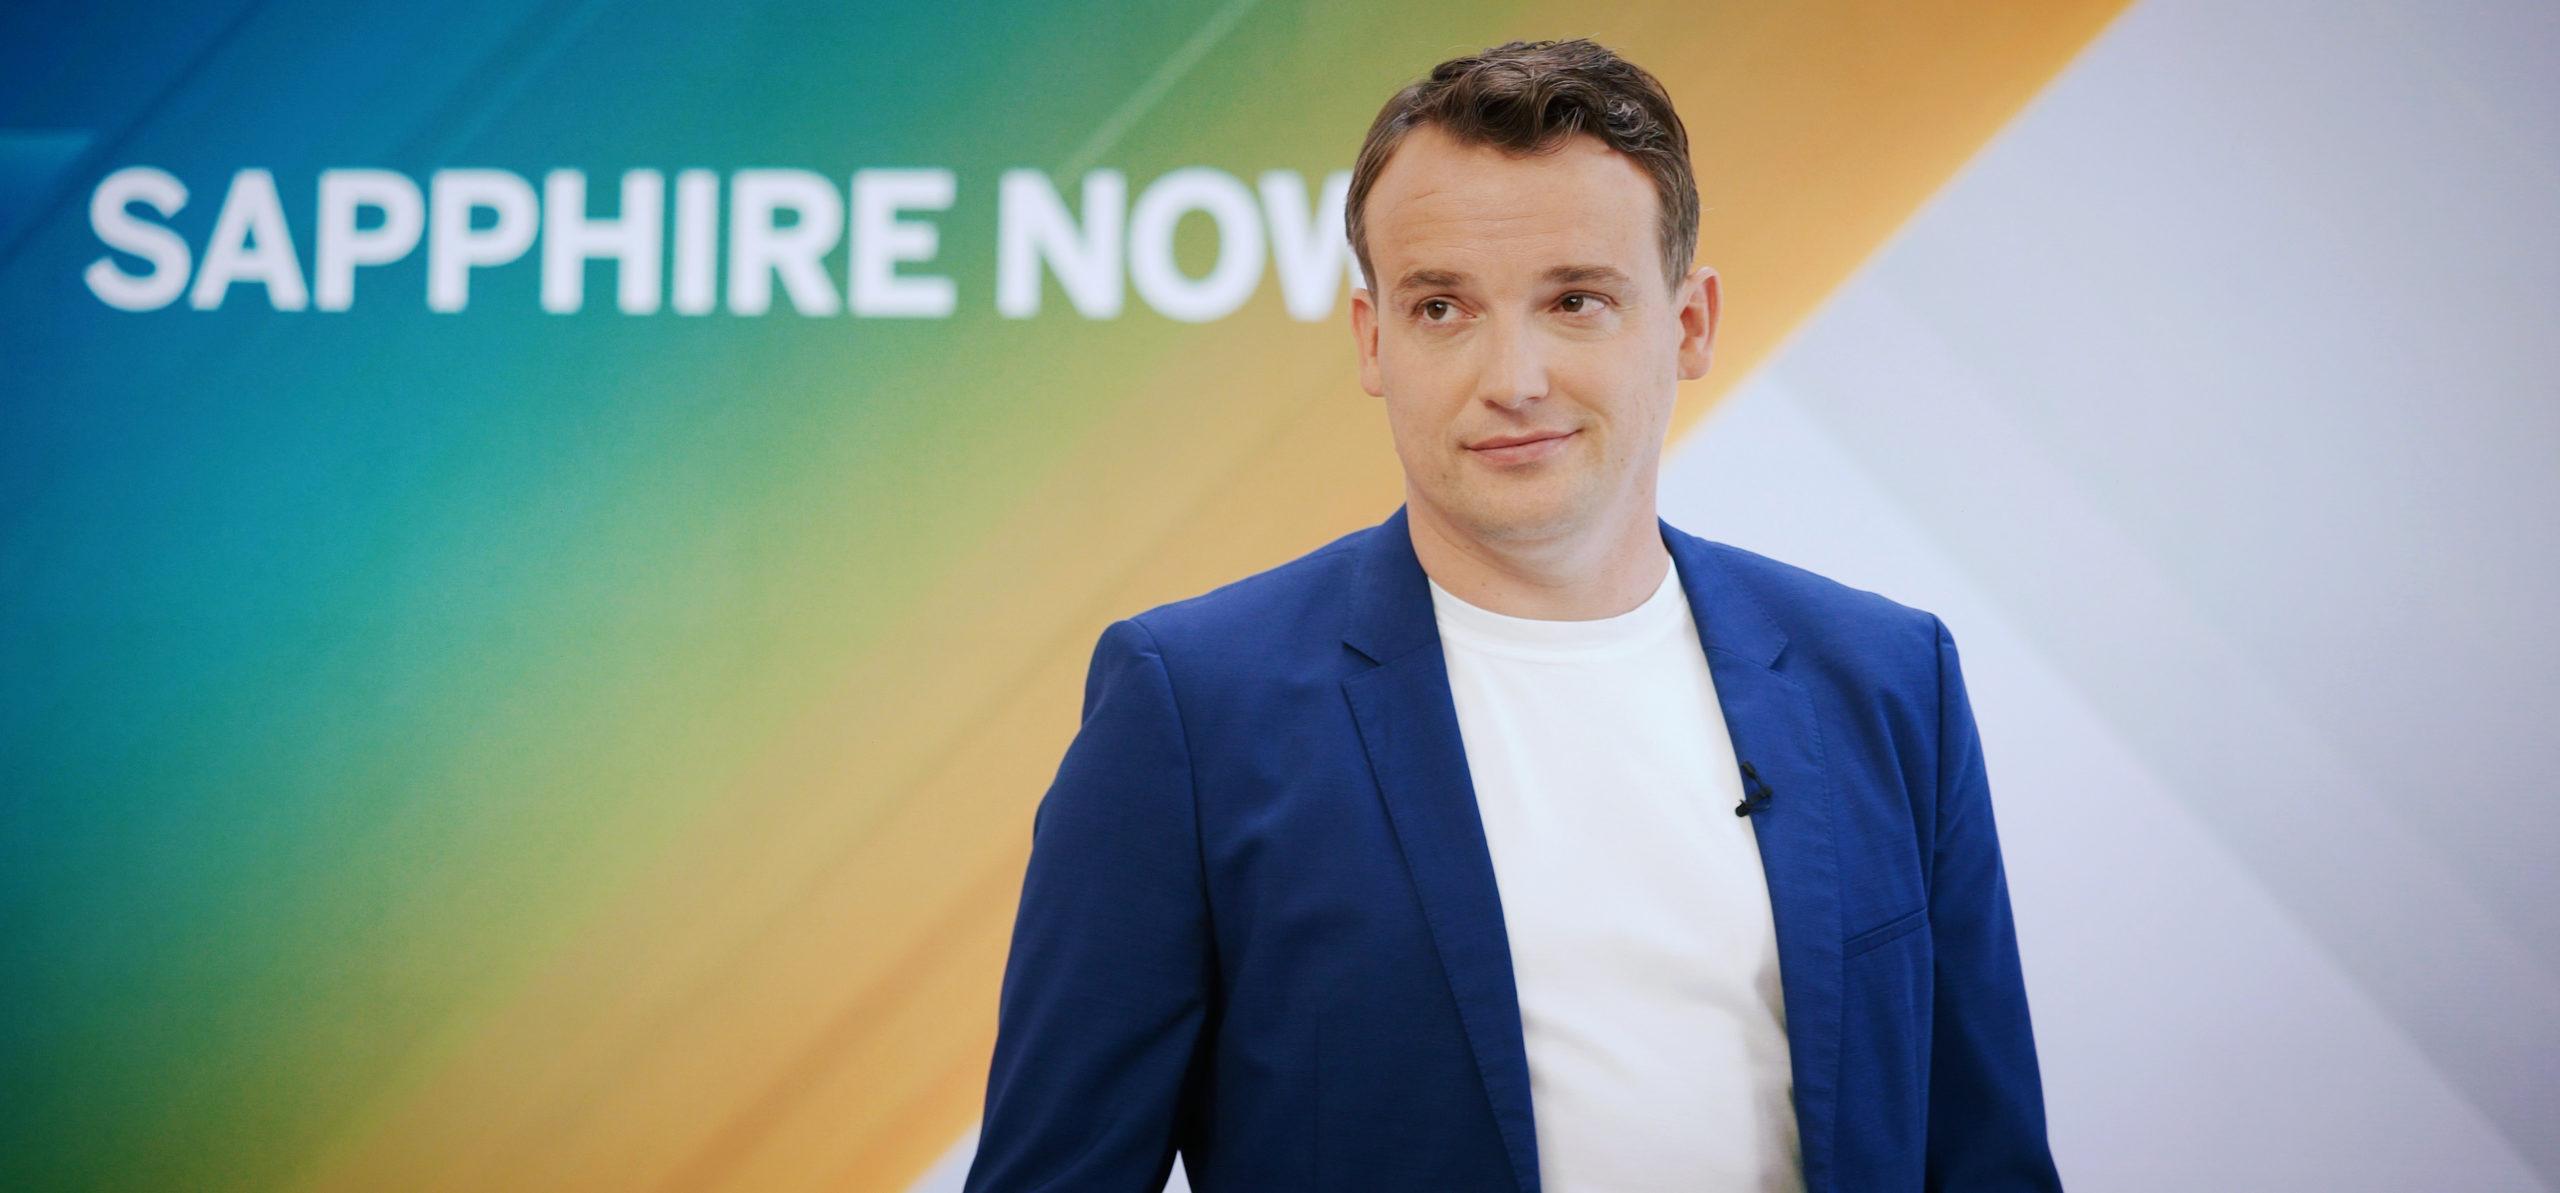 SAP: To SAPPHIRE NOW παρουσιάζει νέες καινοτόμες λύσεις